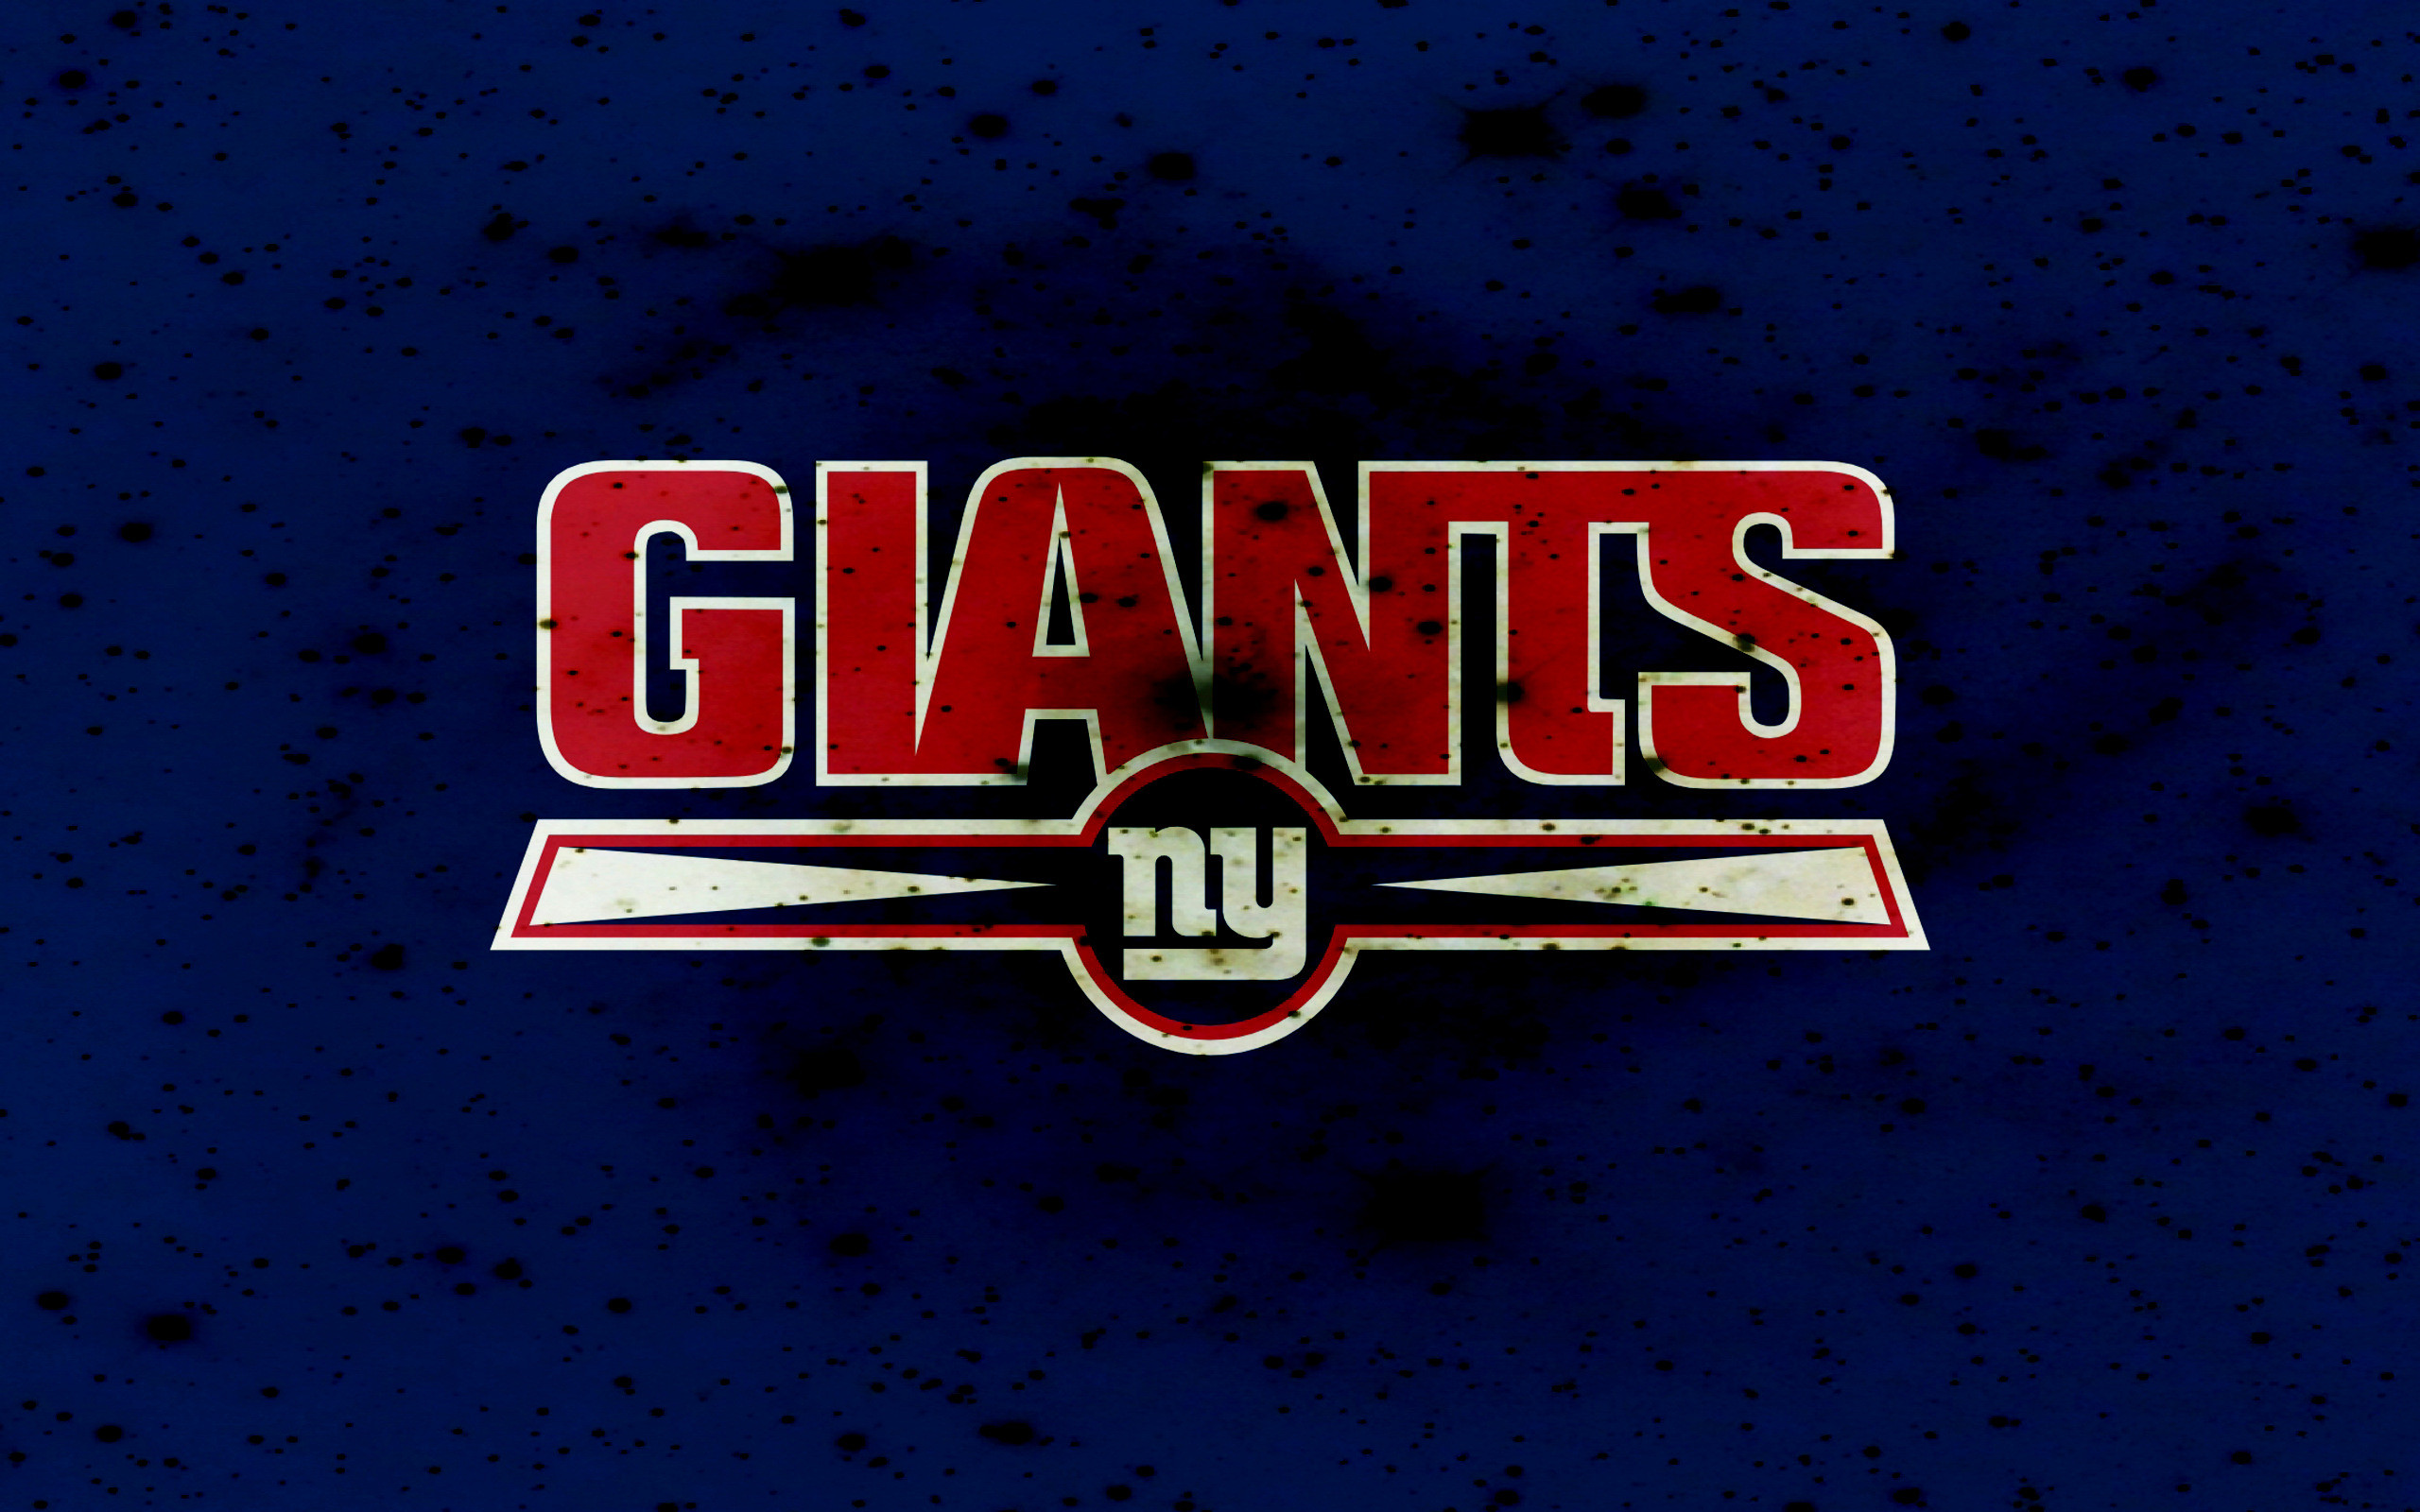 NFL Backgrounds   HD Wallpapers   Pinterest   Hd wallpaper and Wallpaper